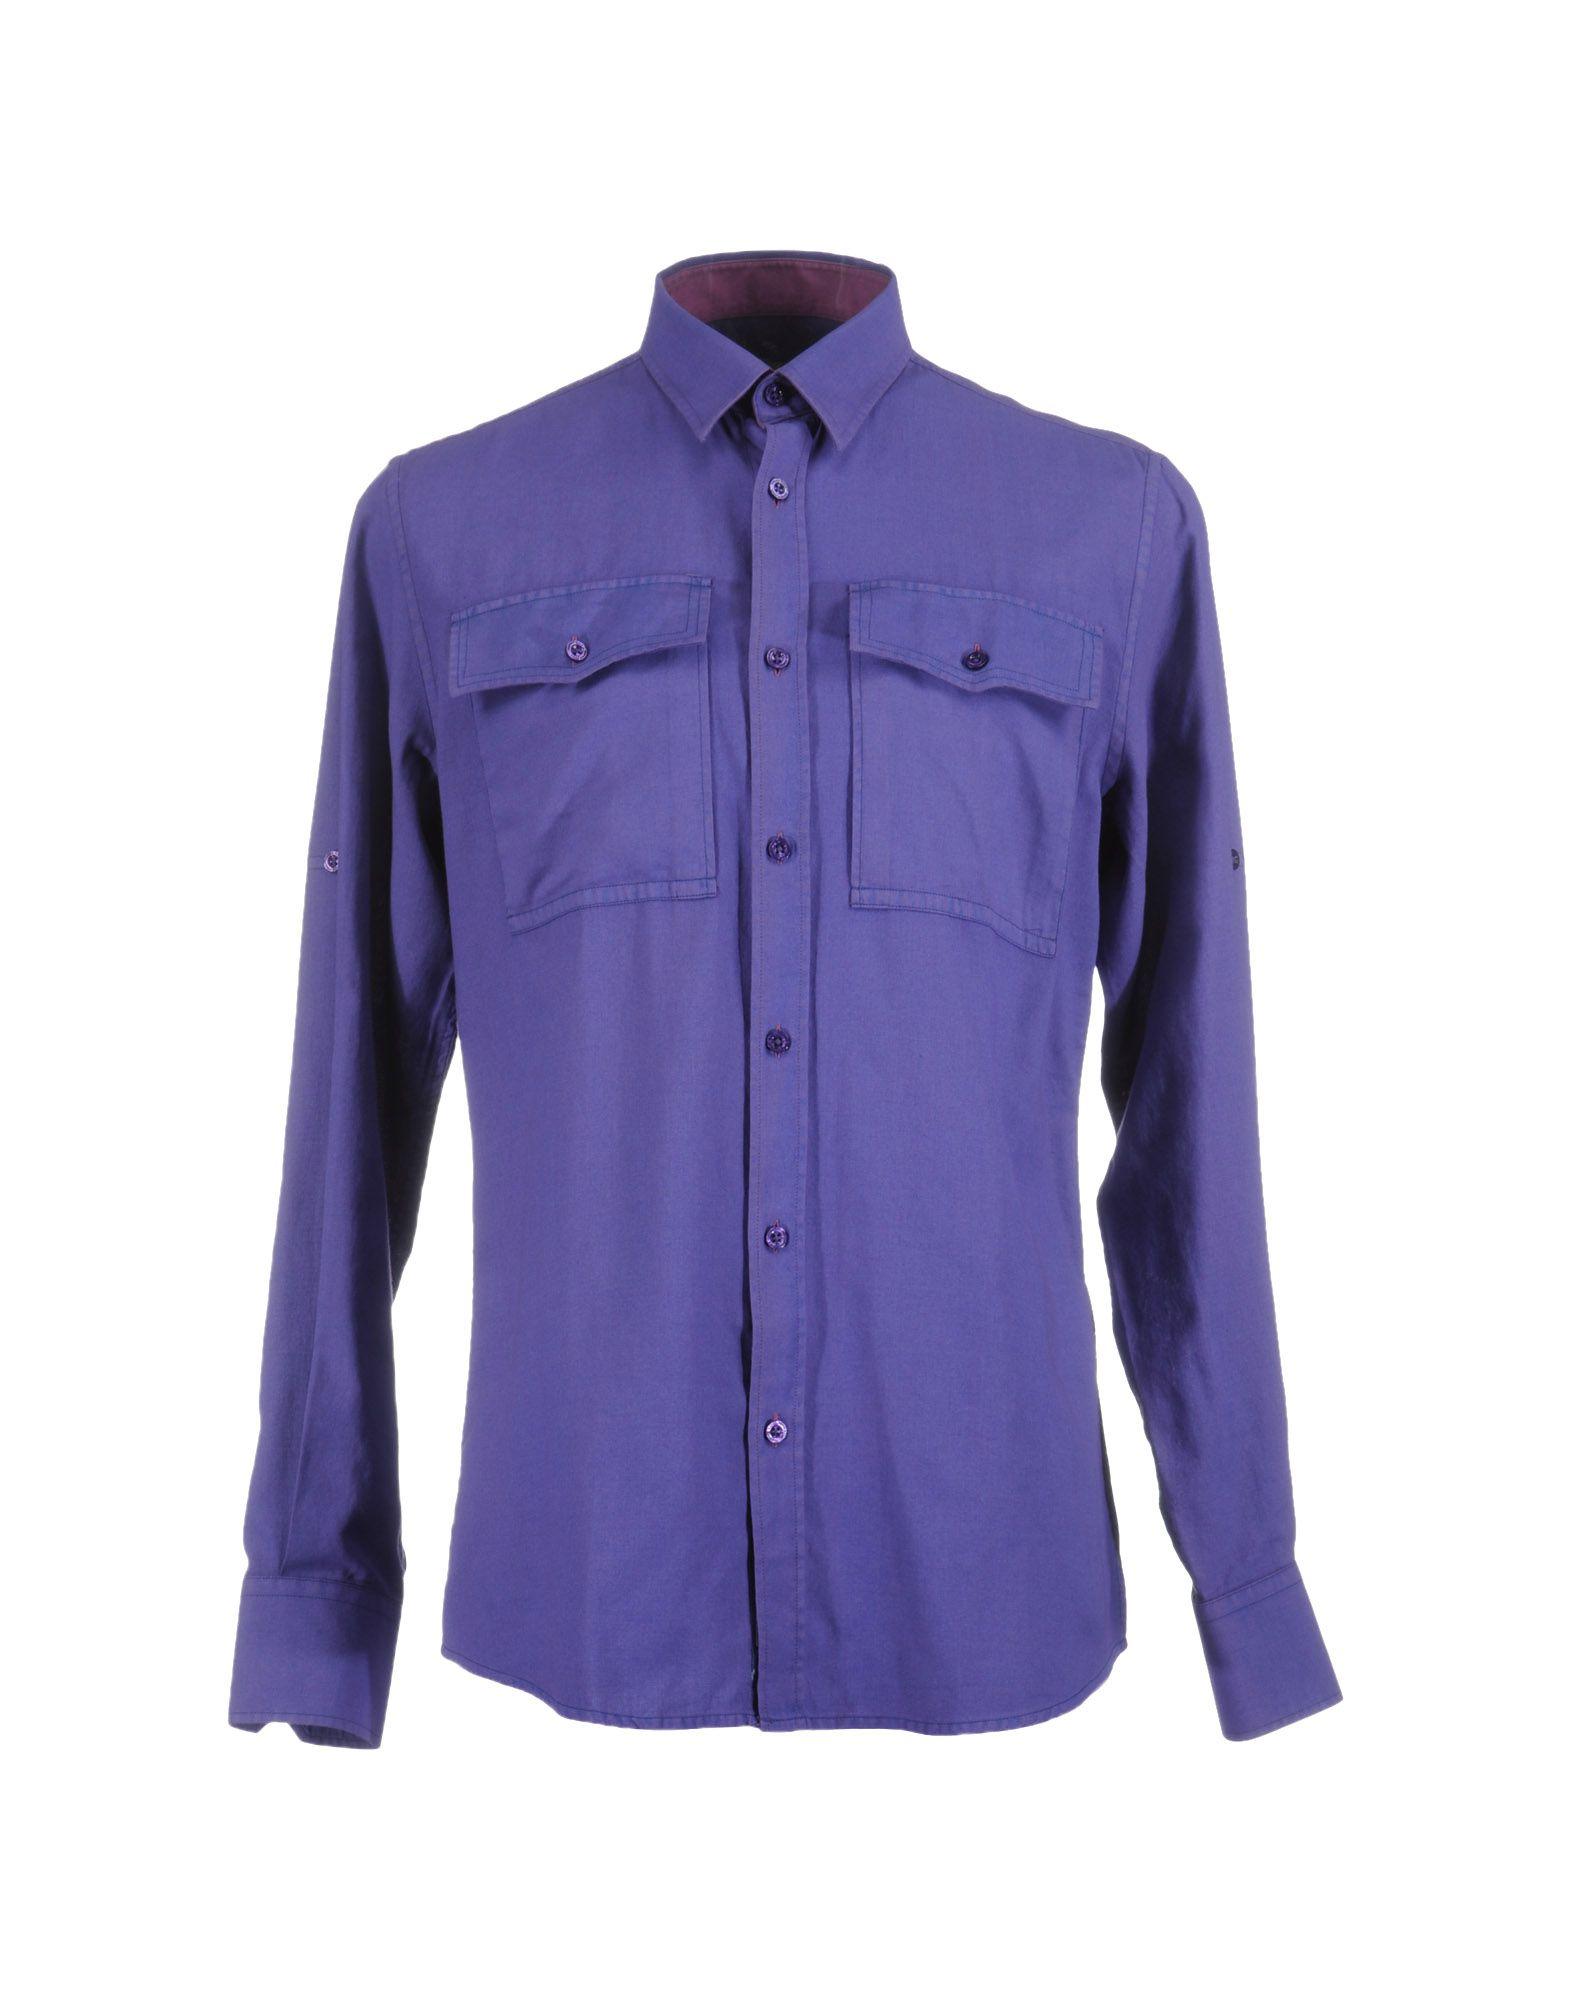 Фото - VERSACE JEANS Рубашка с длинными рукавами рубашка однотонная с длинными рукавами